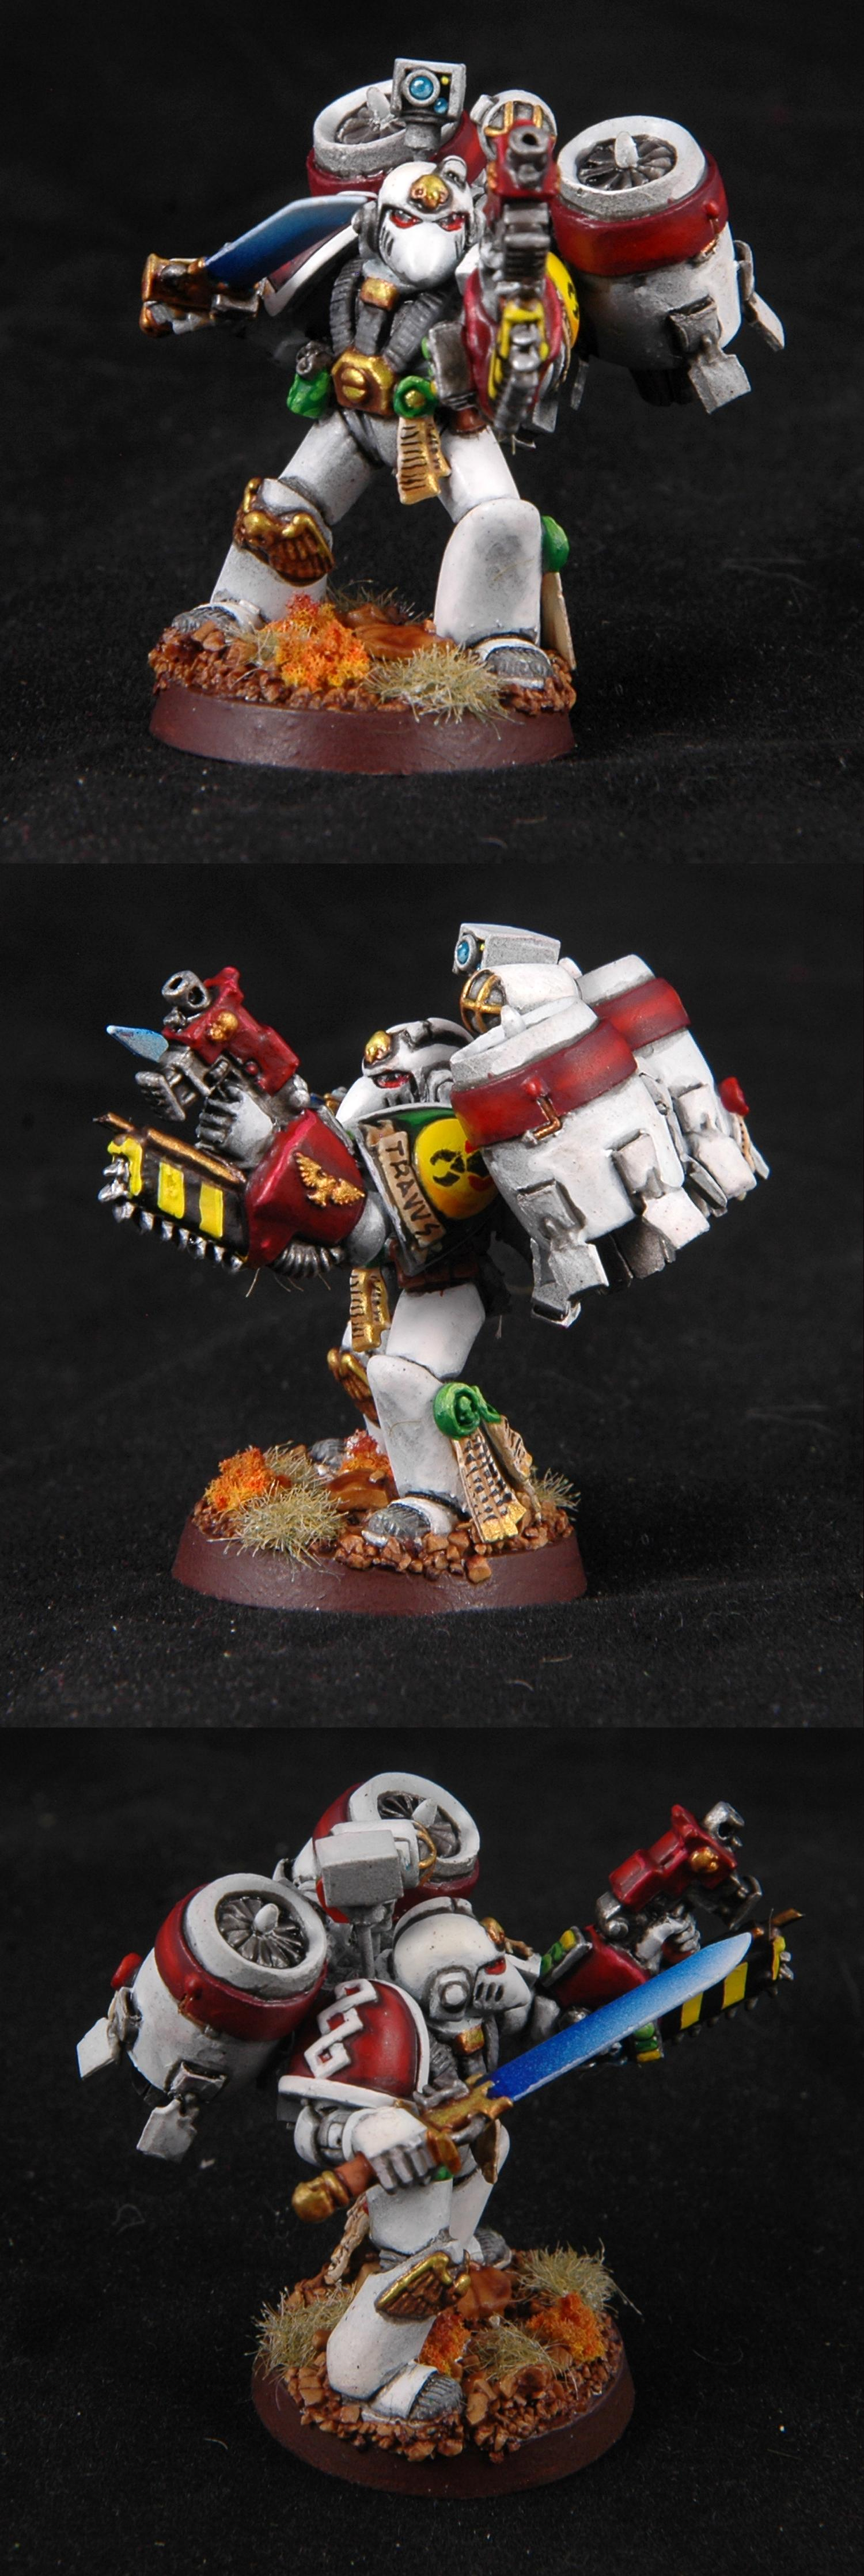 Apothecary, Mantis Warriors, Space Marines, Warhammer 40,000